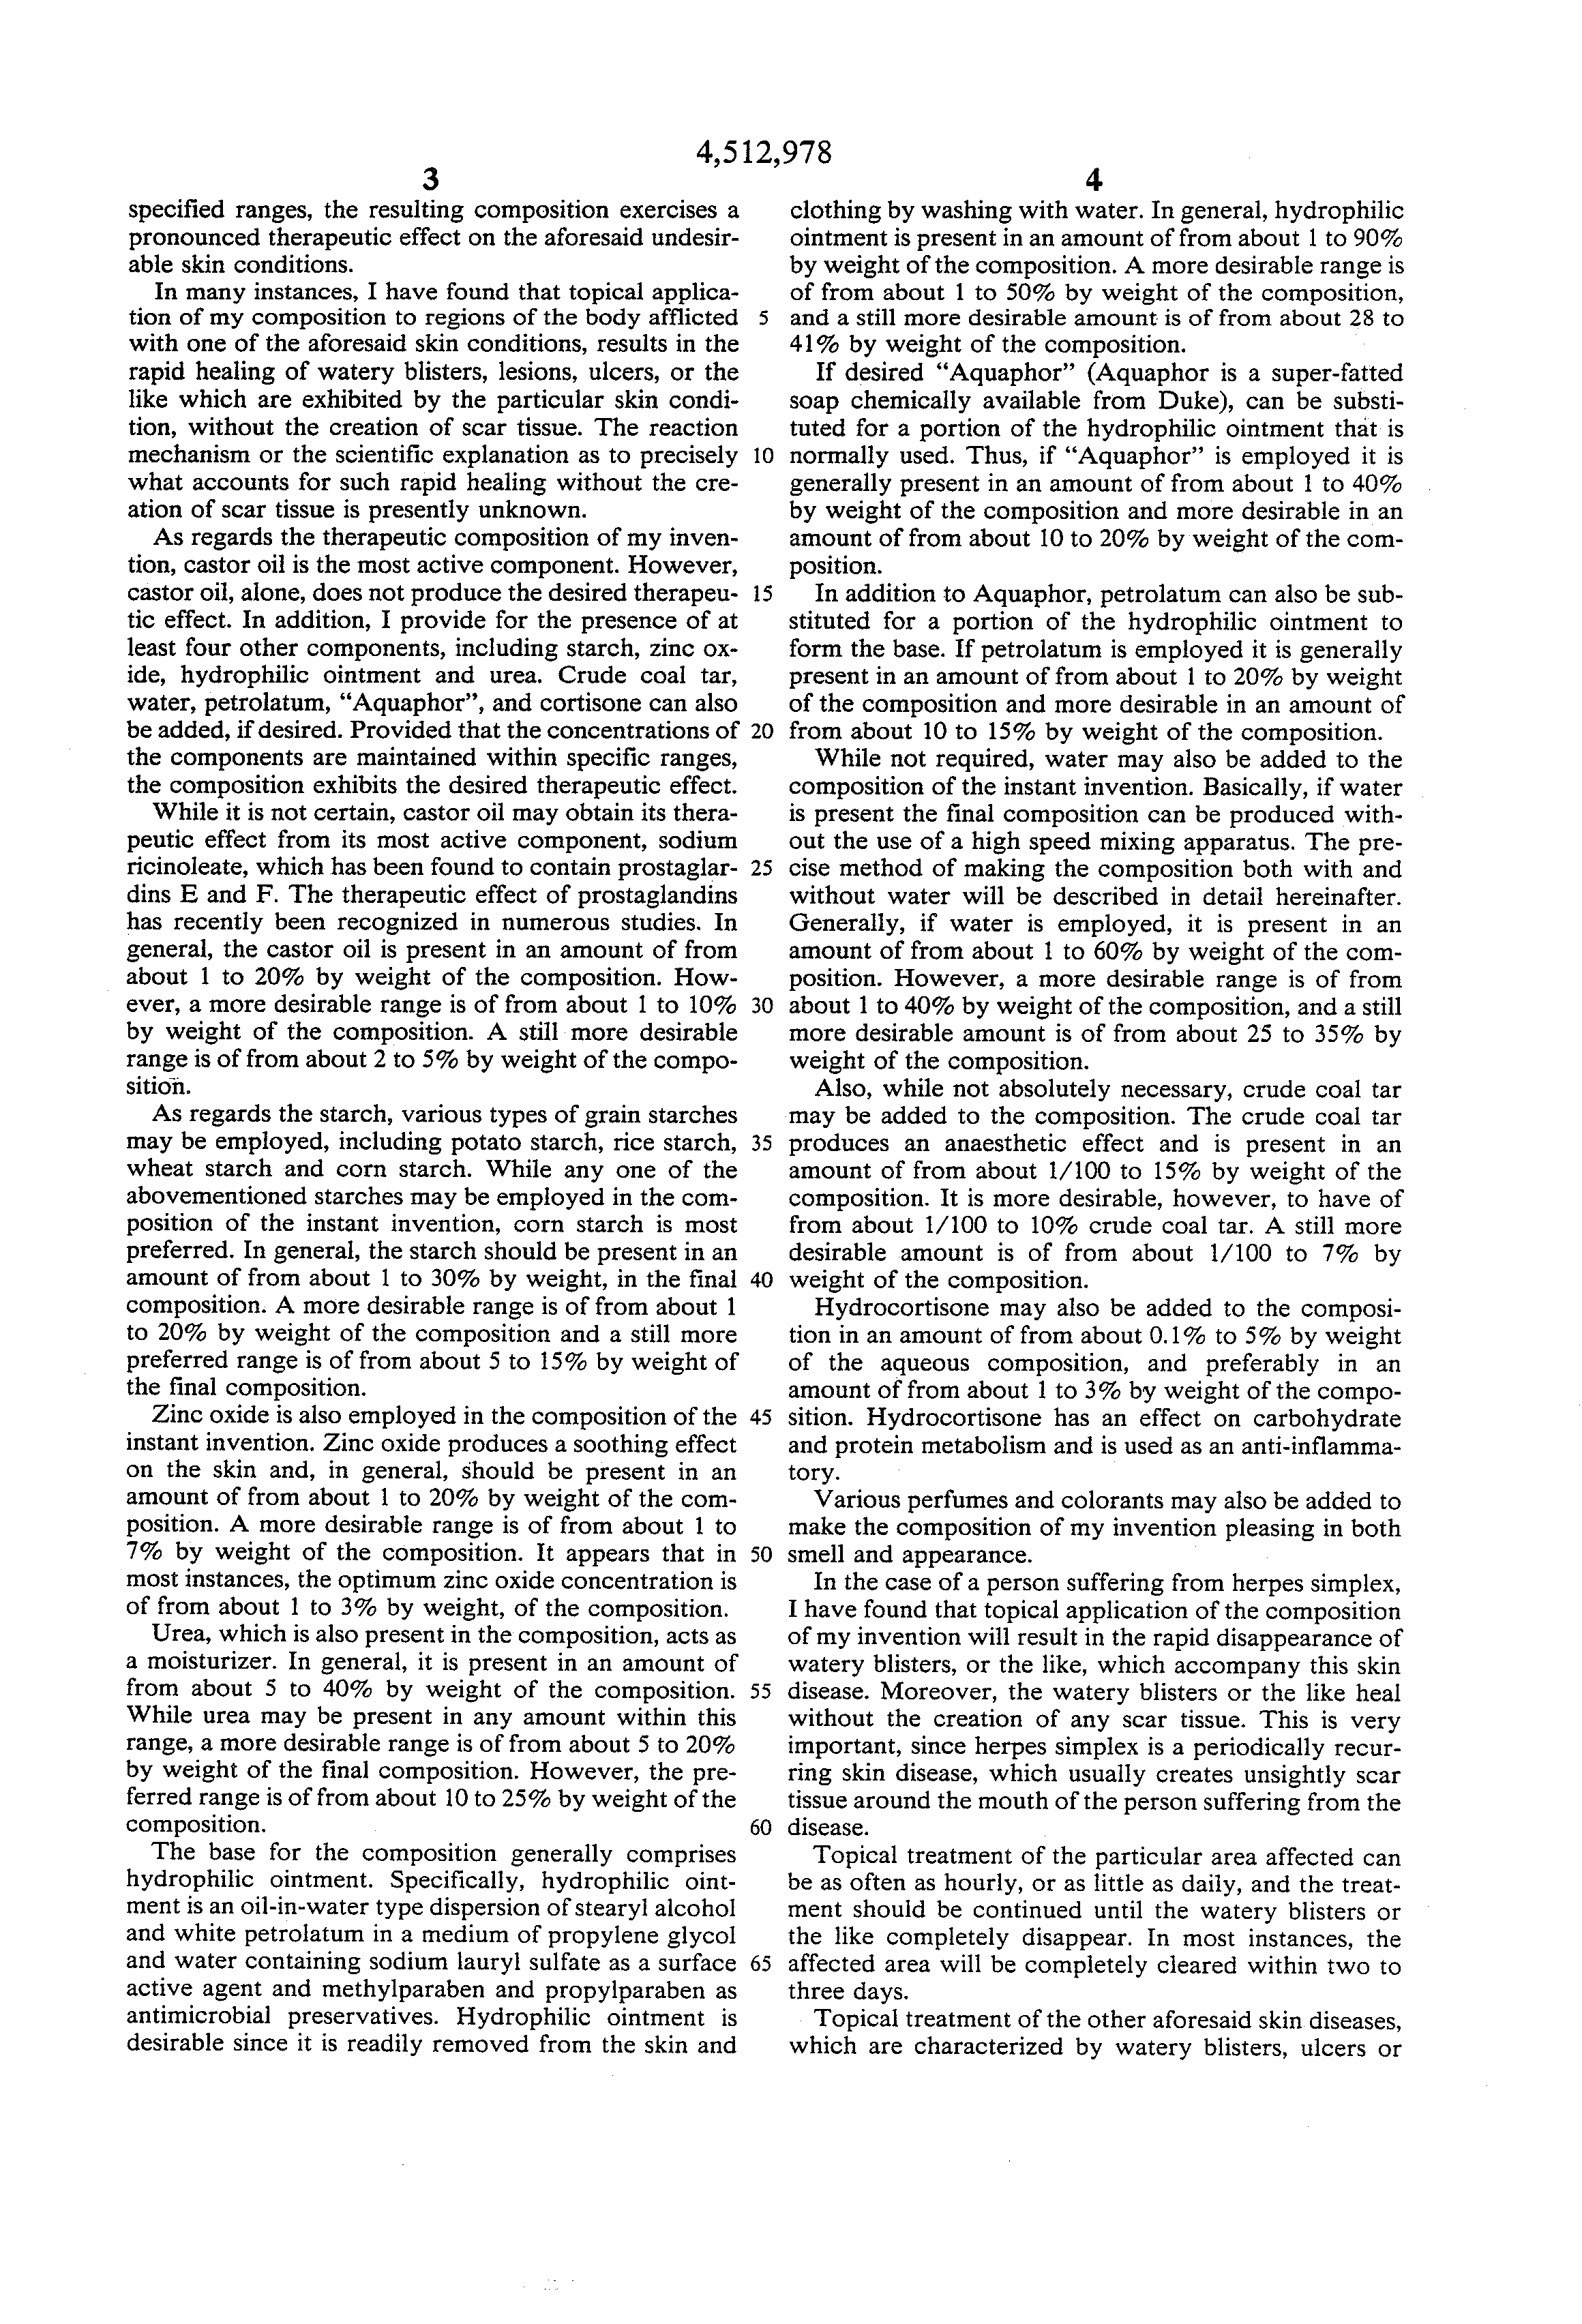 Victorian bushfire essay